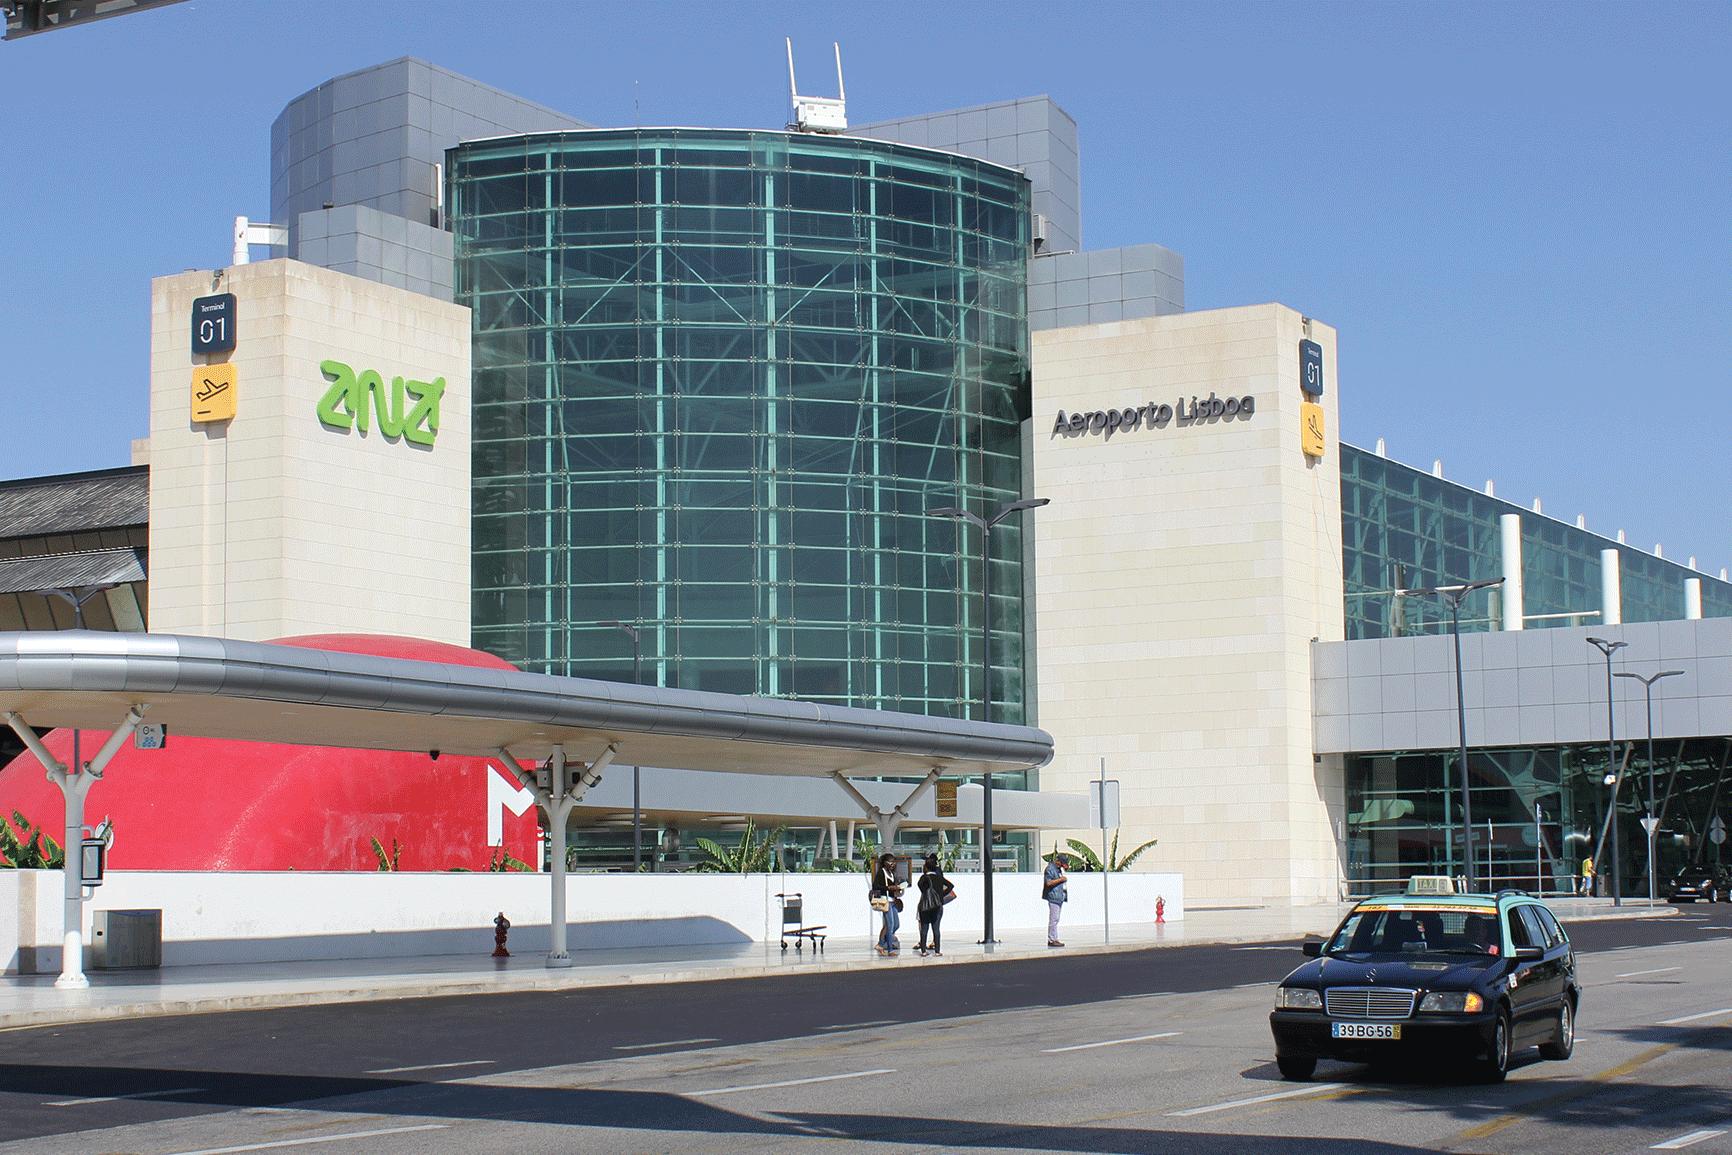 Aeroporto da Portela Lisboa